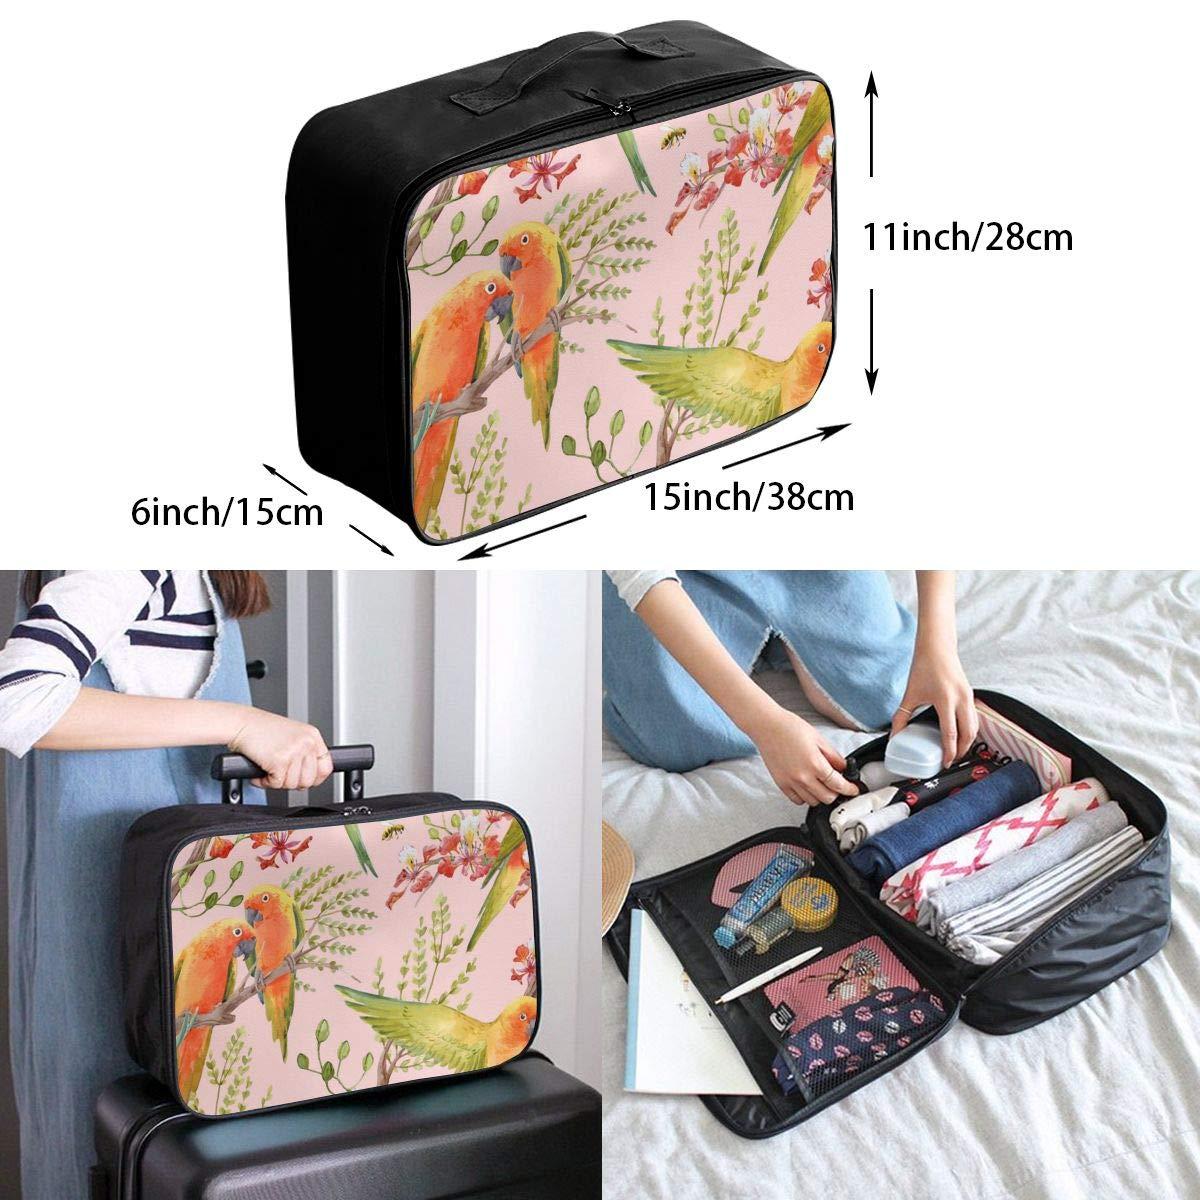 ADGAI Parrot Couple Canvas Travel Weekender Bag,Fashion Custom Lightweight Large Capacity Portable Luggage Bag,Suitcase Trolley Bag